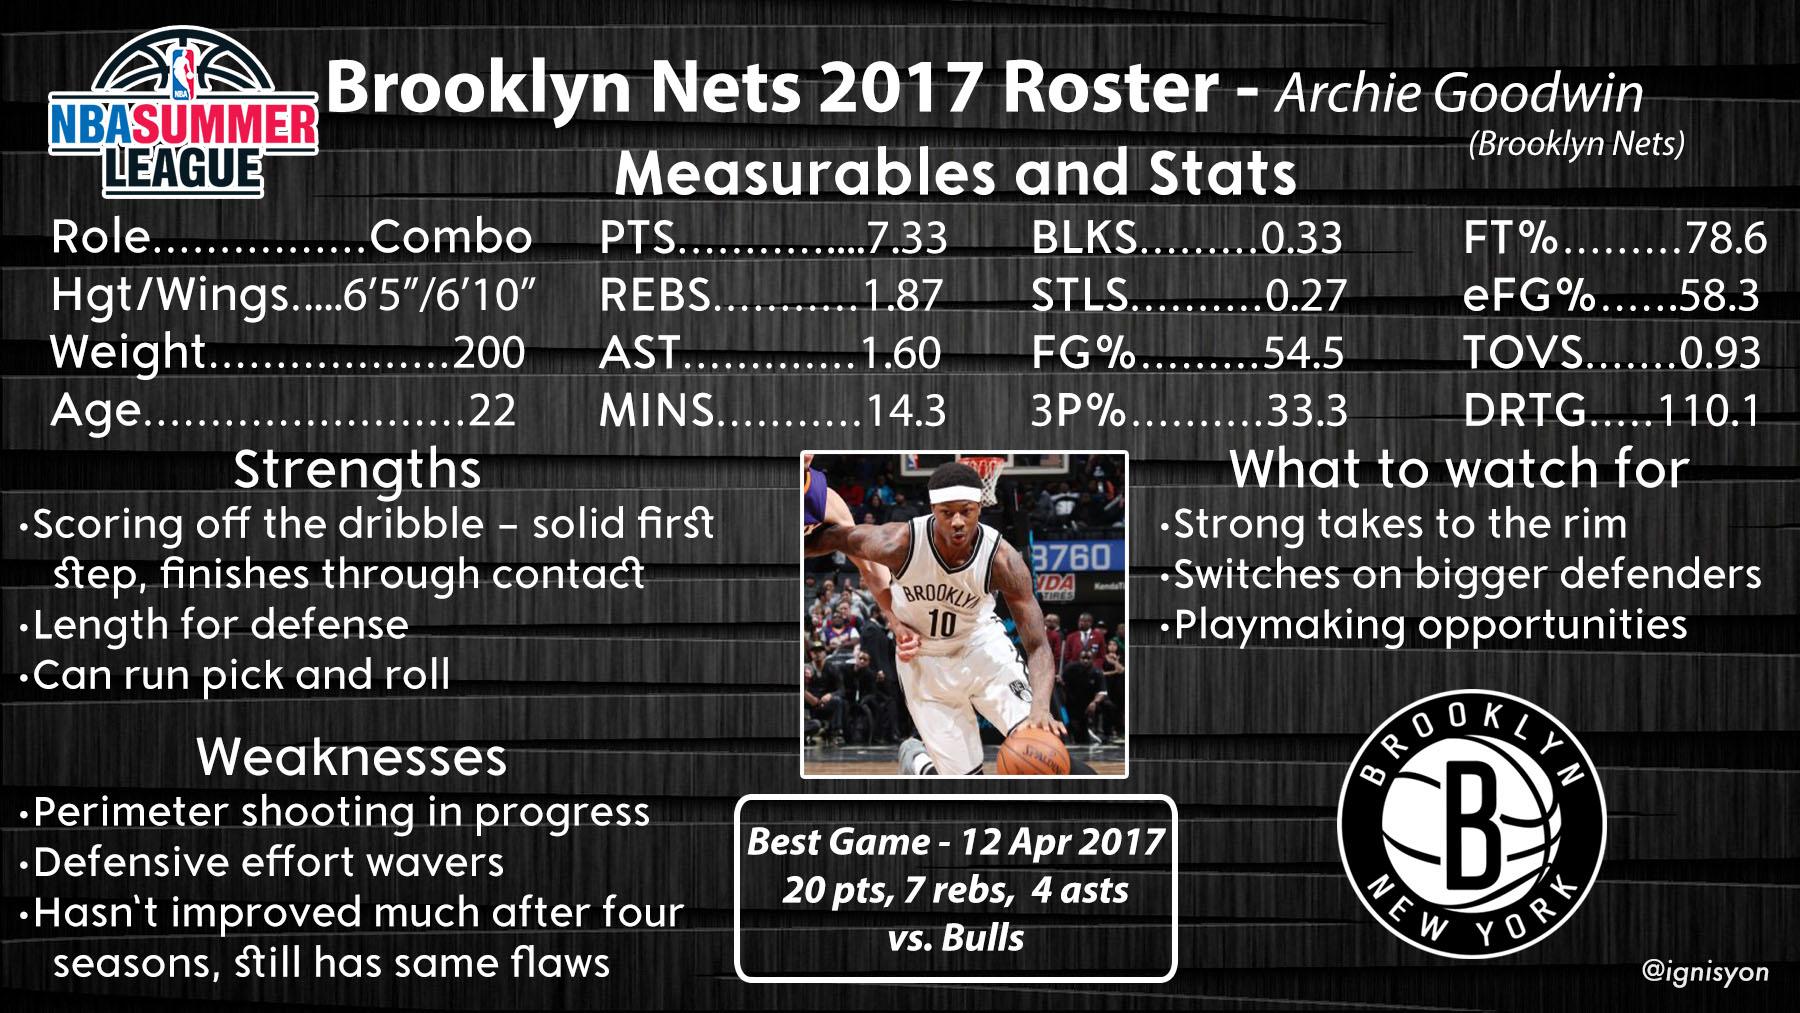 Brooklyn Nets Summer League Profile - Archie Goodwin